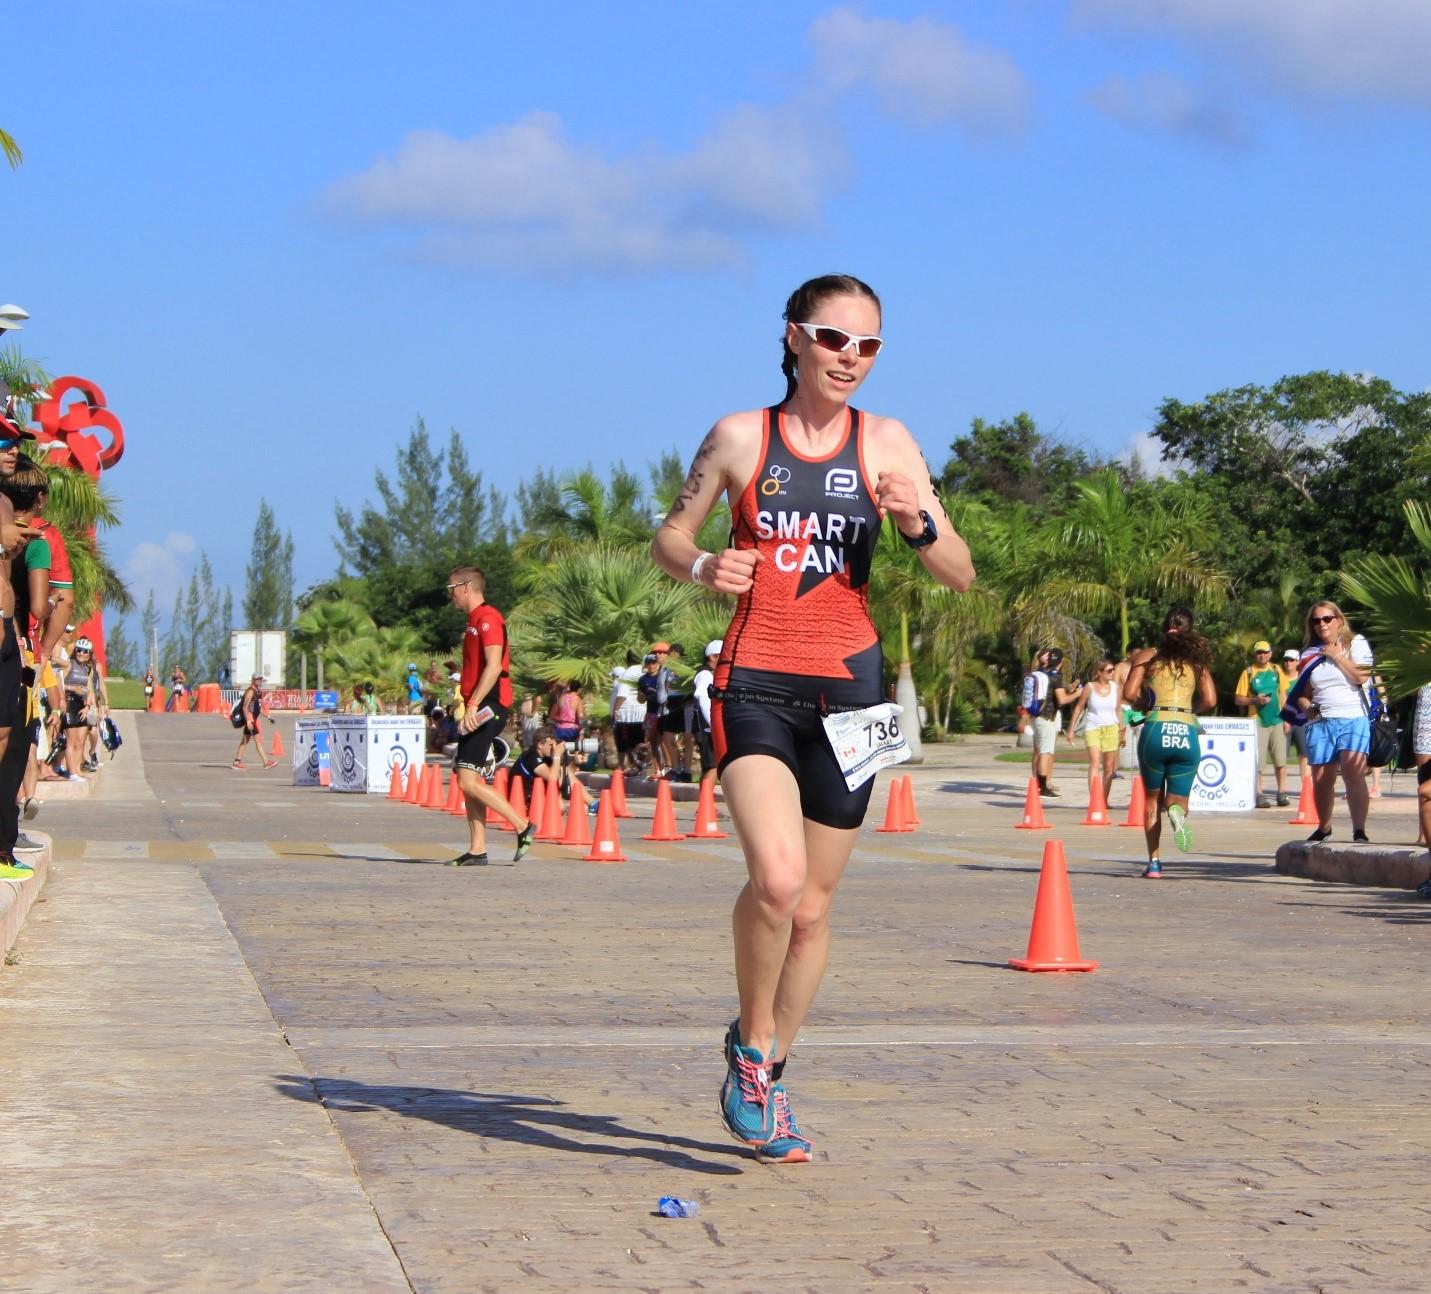 Courtenay Smart Cozumel Mexico World Championships